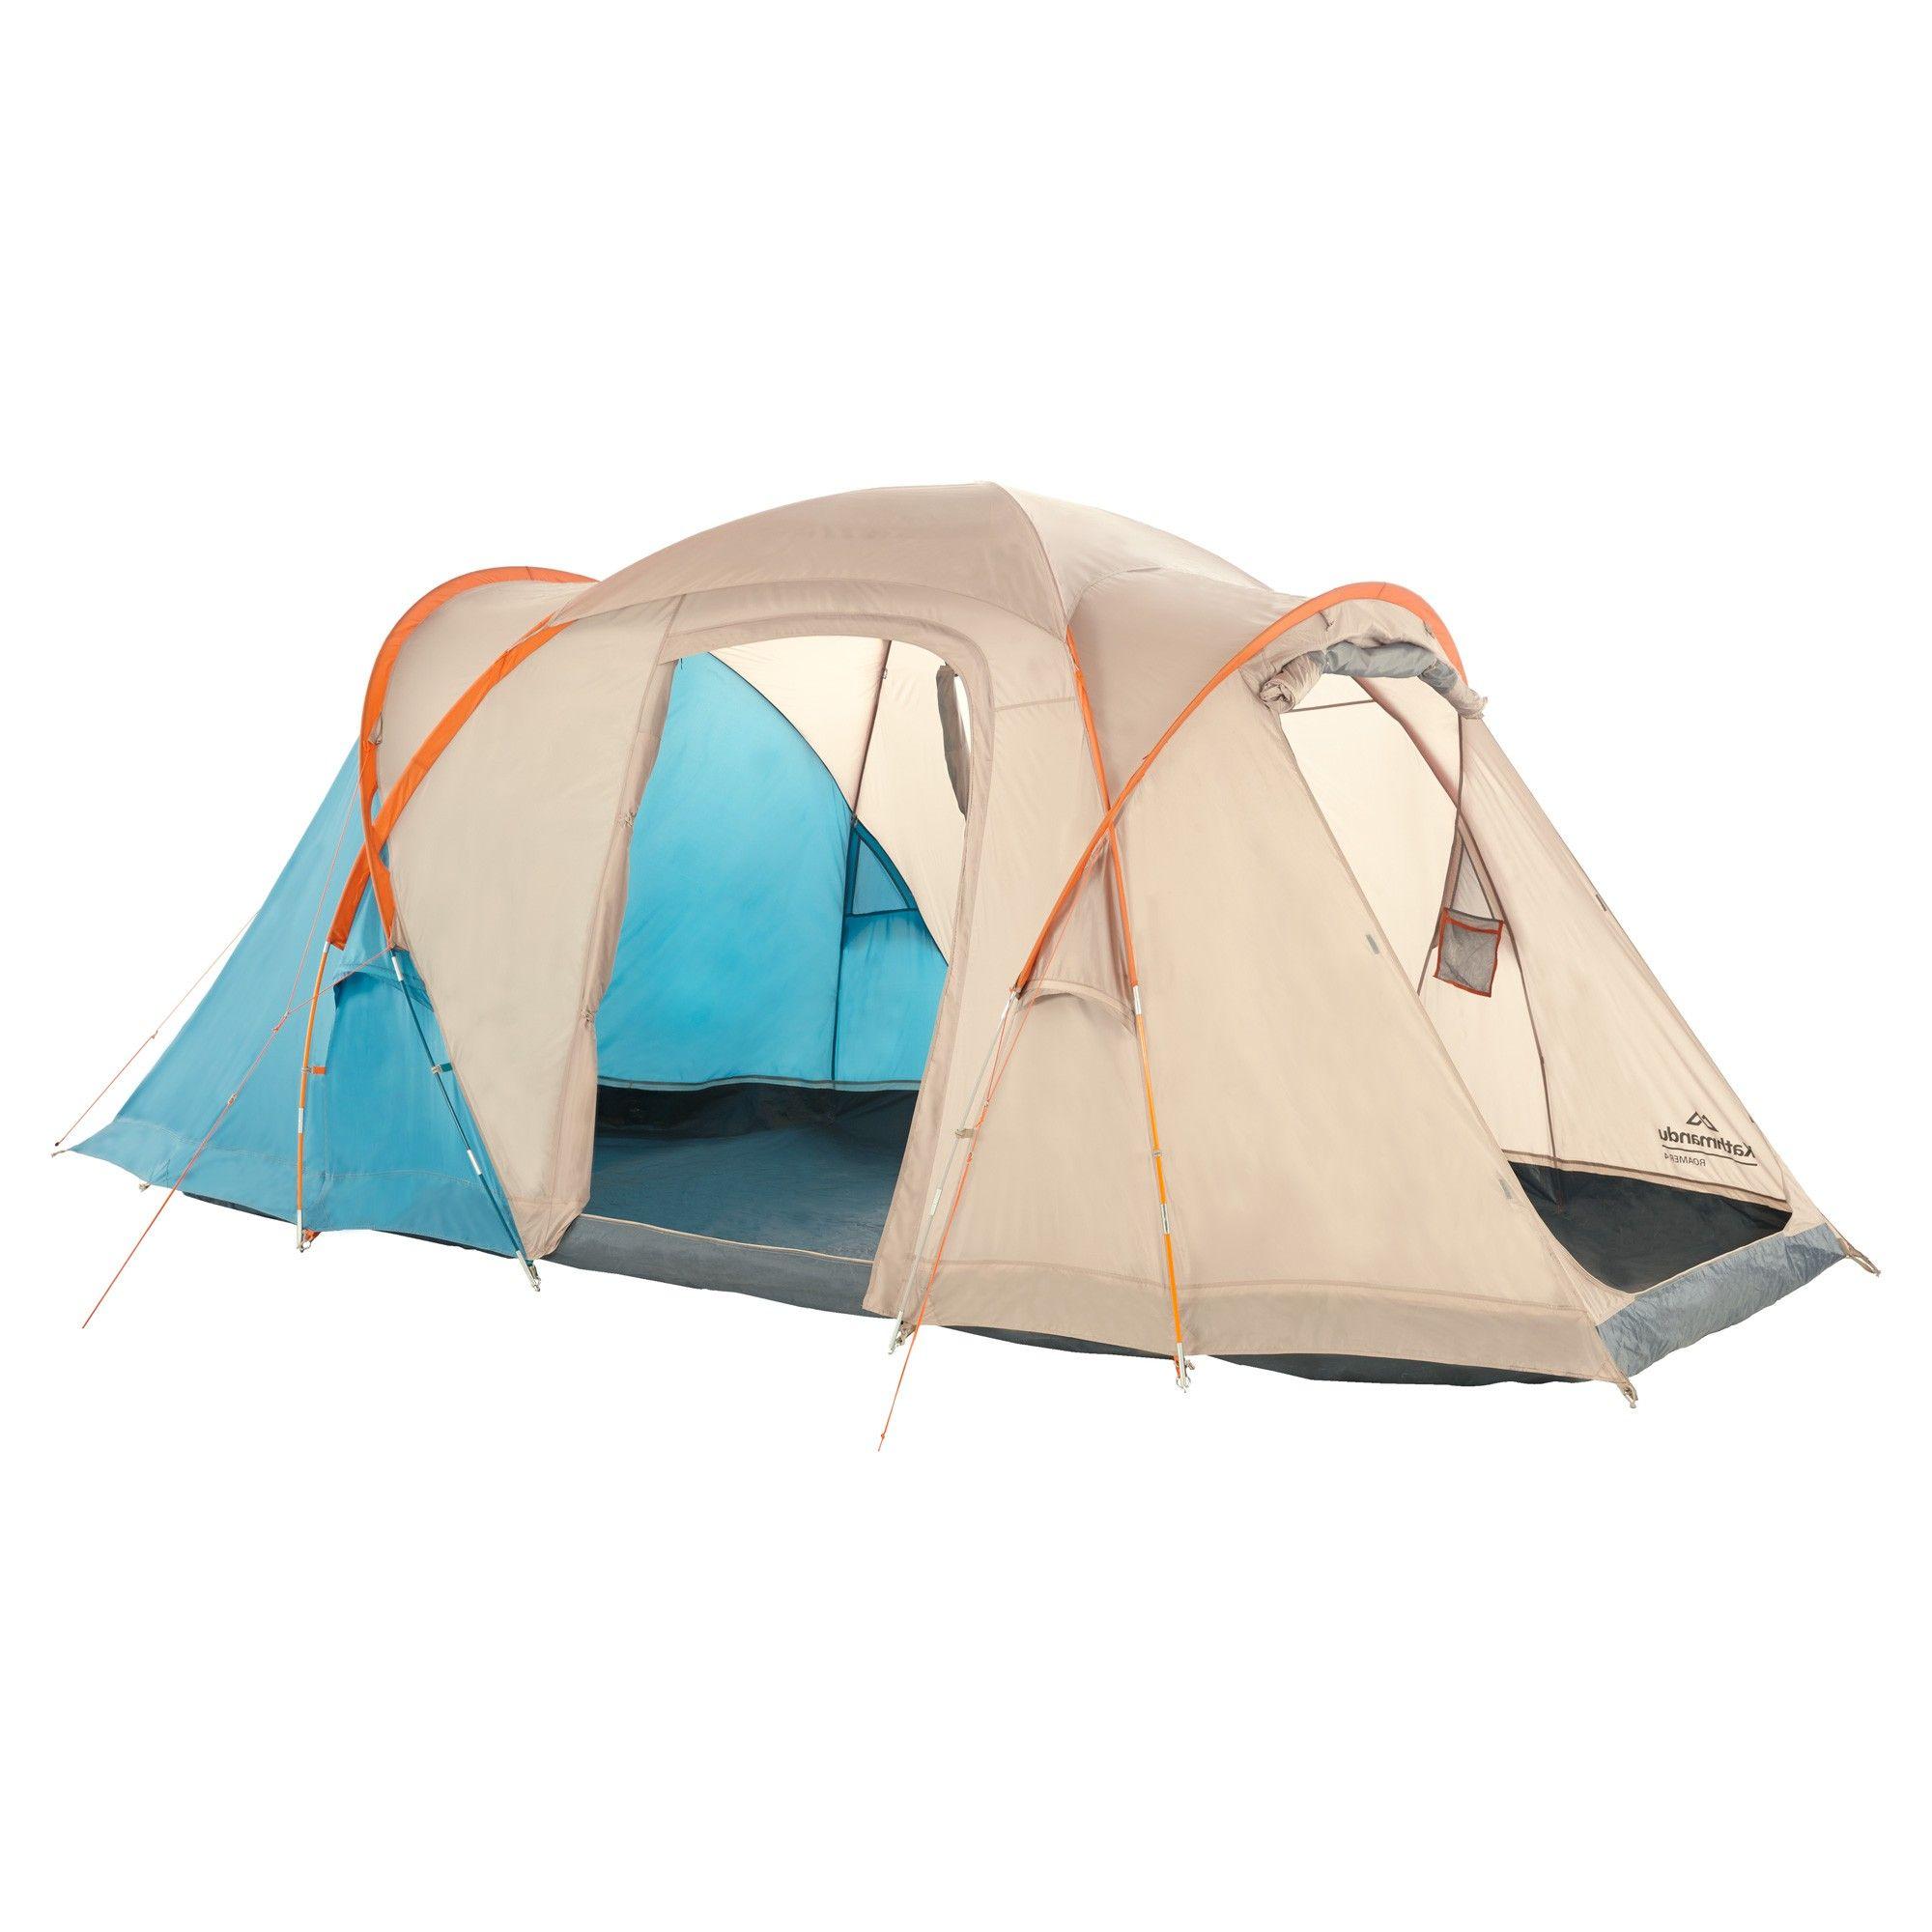 Buy Roamer 4 Person Tent